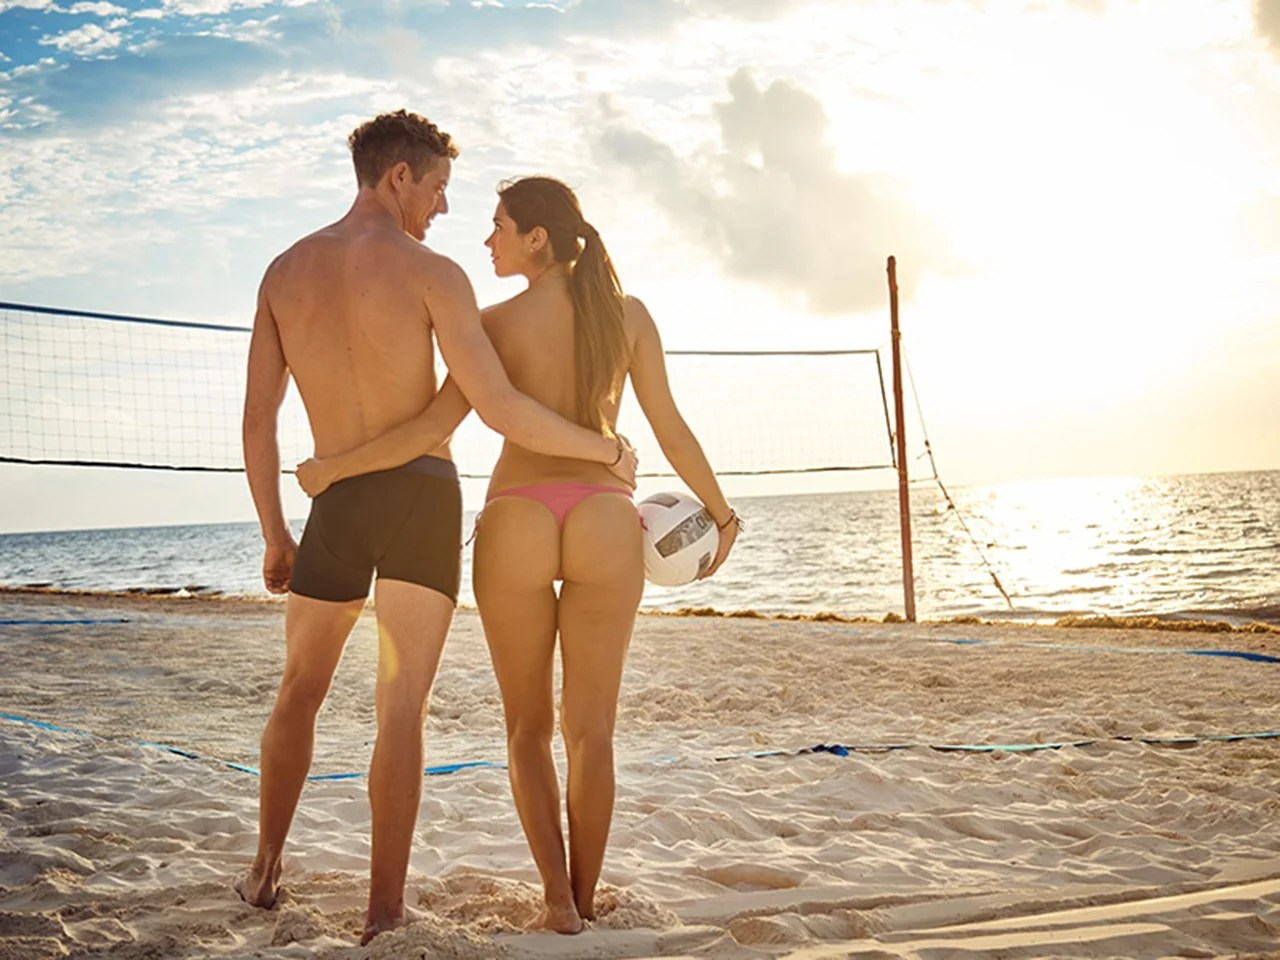 Bikini and water babes pagents